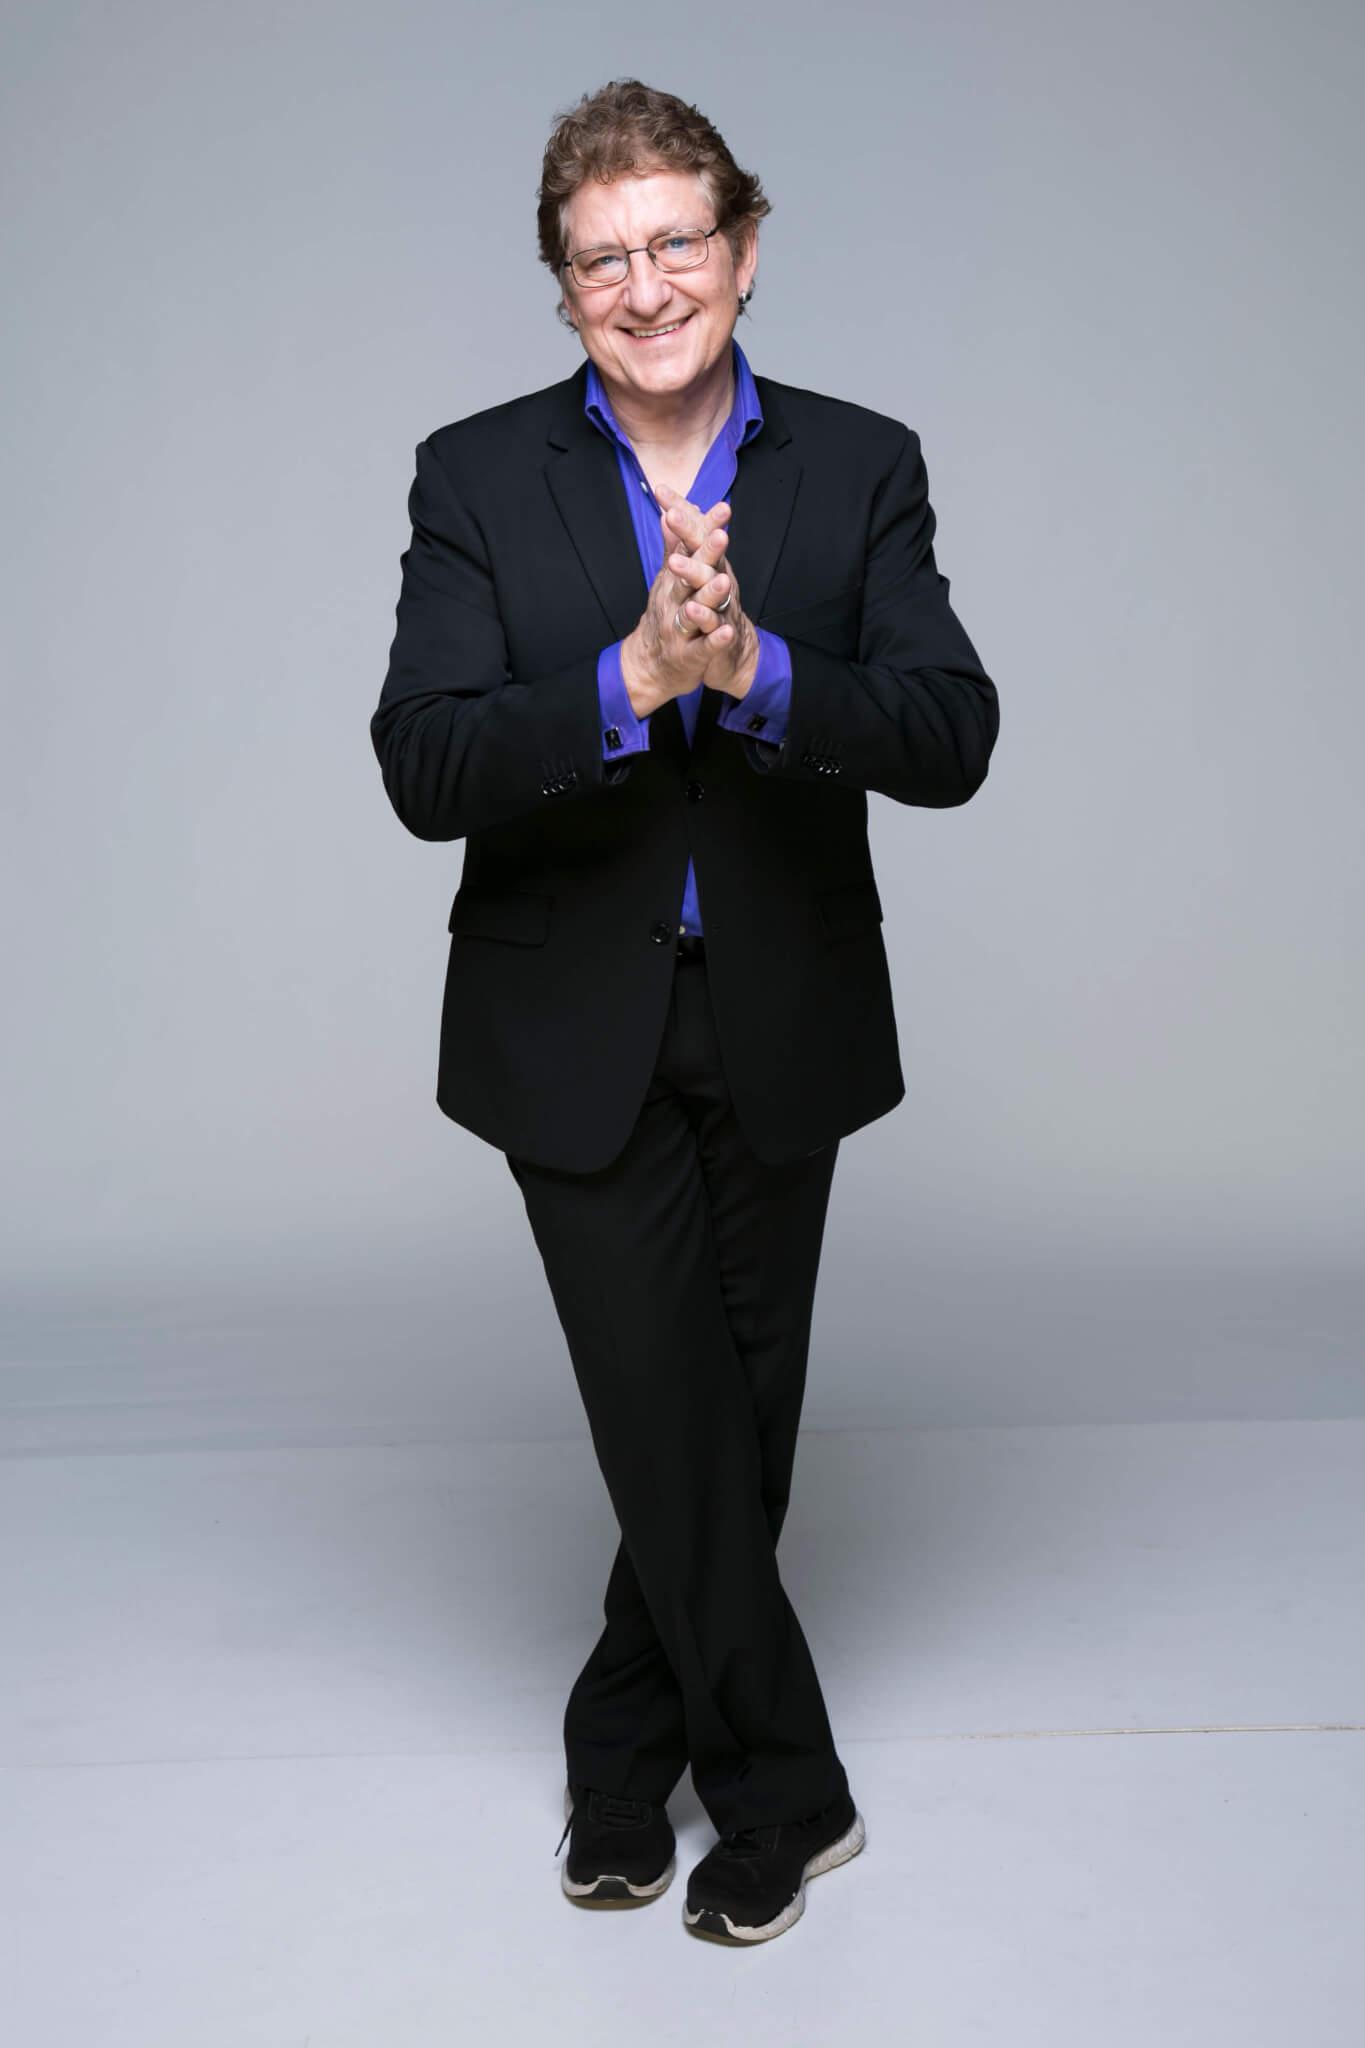 Richard Stubbs | MC & Comedian